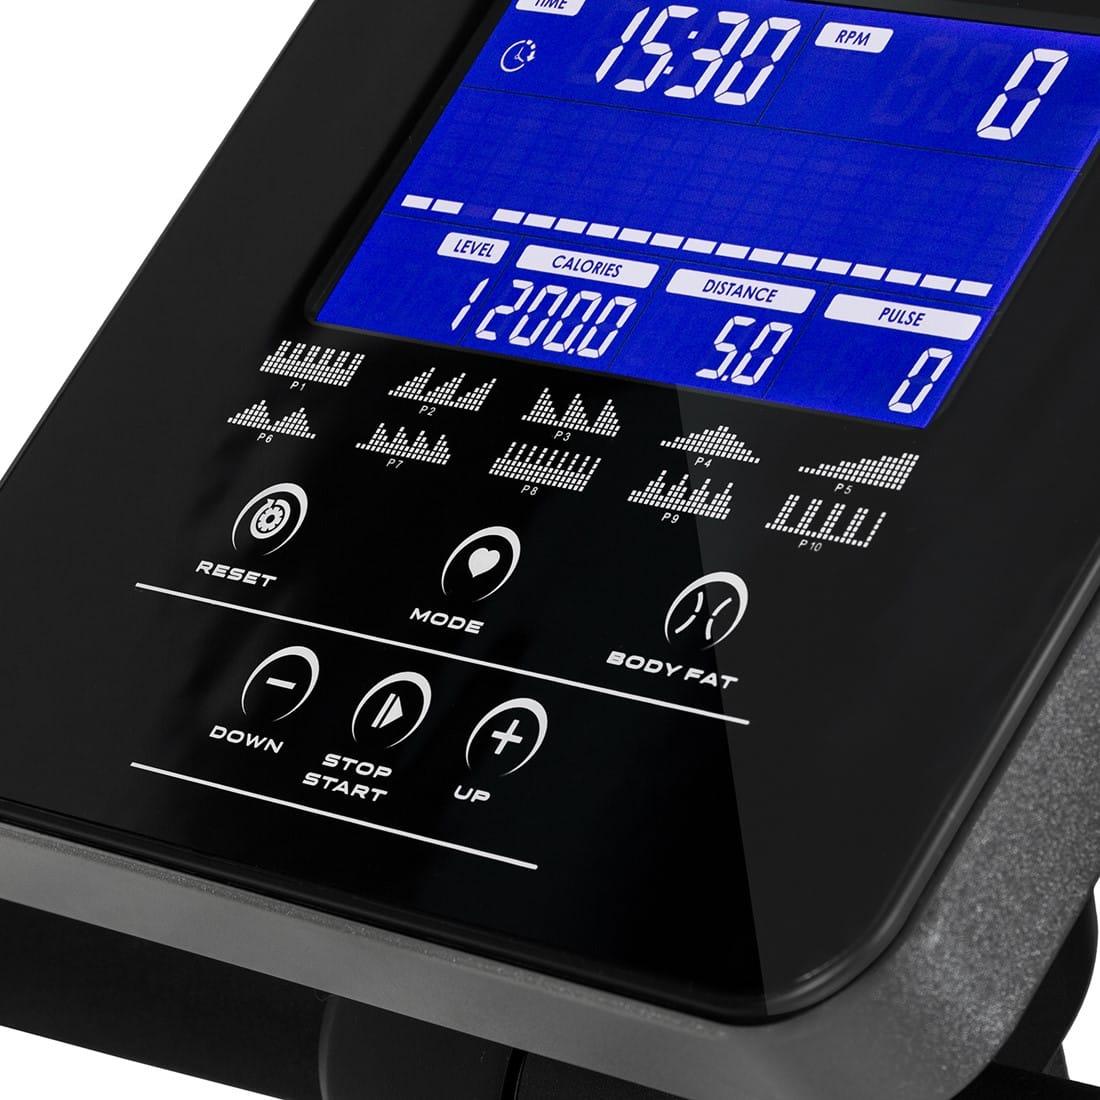 virtufit-htr-30i-ergometer-hometrainer-display-close